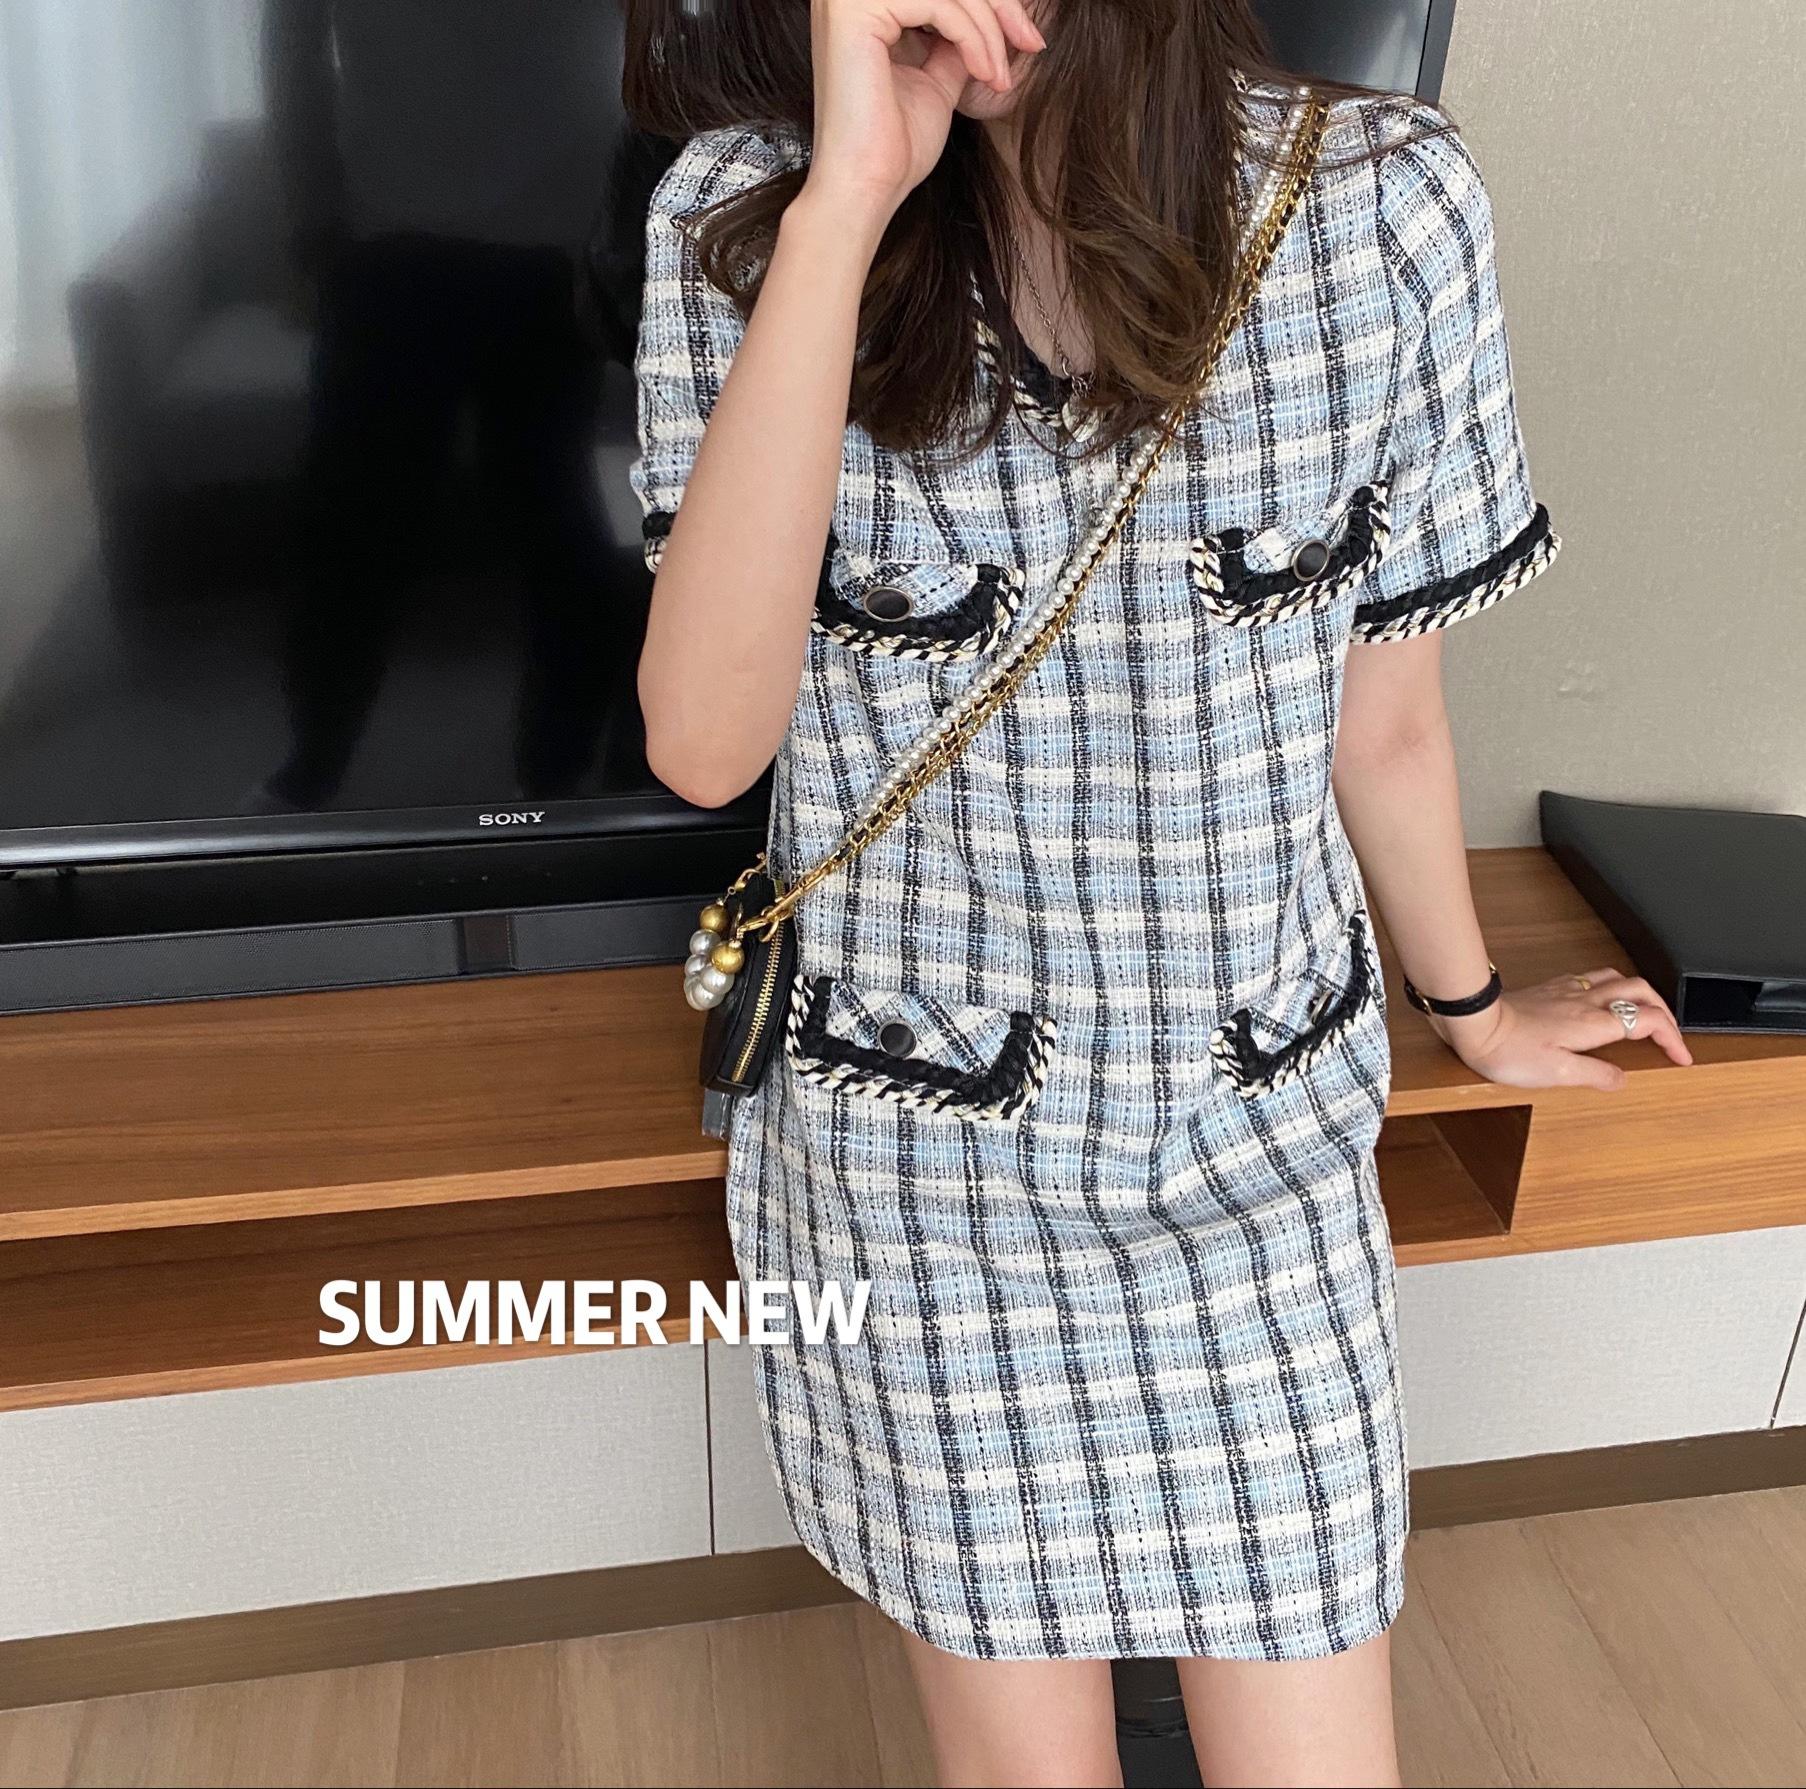 Cong dating dress 2020 new Korean summer style Plaid short sleeve woven small fragrance dress